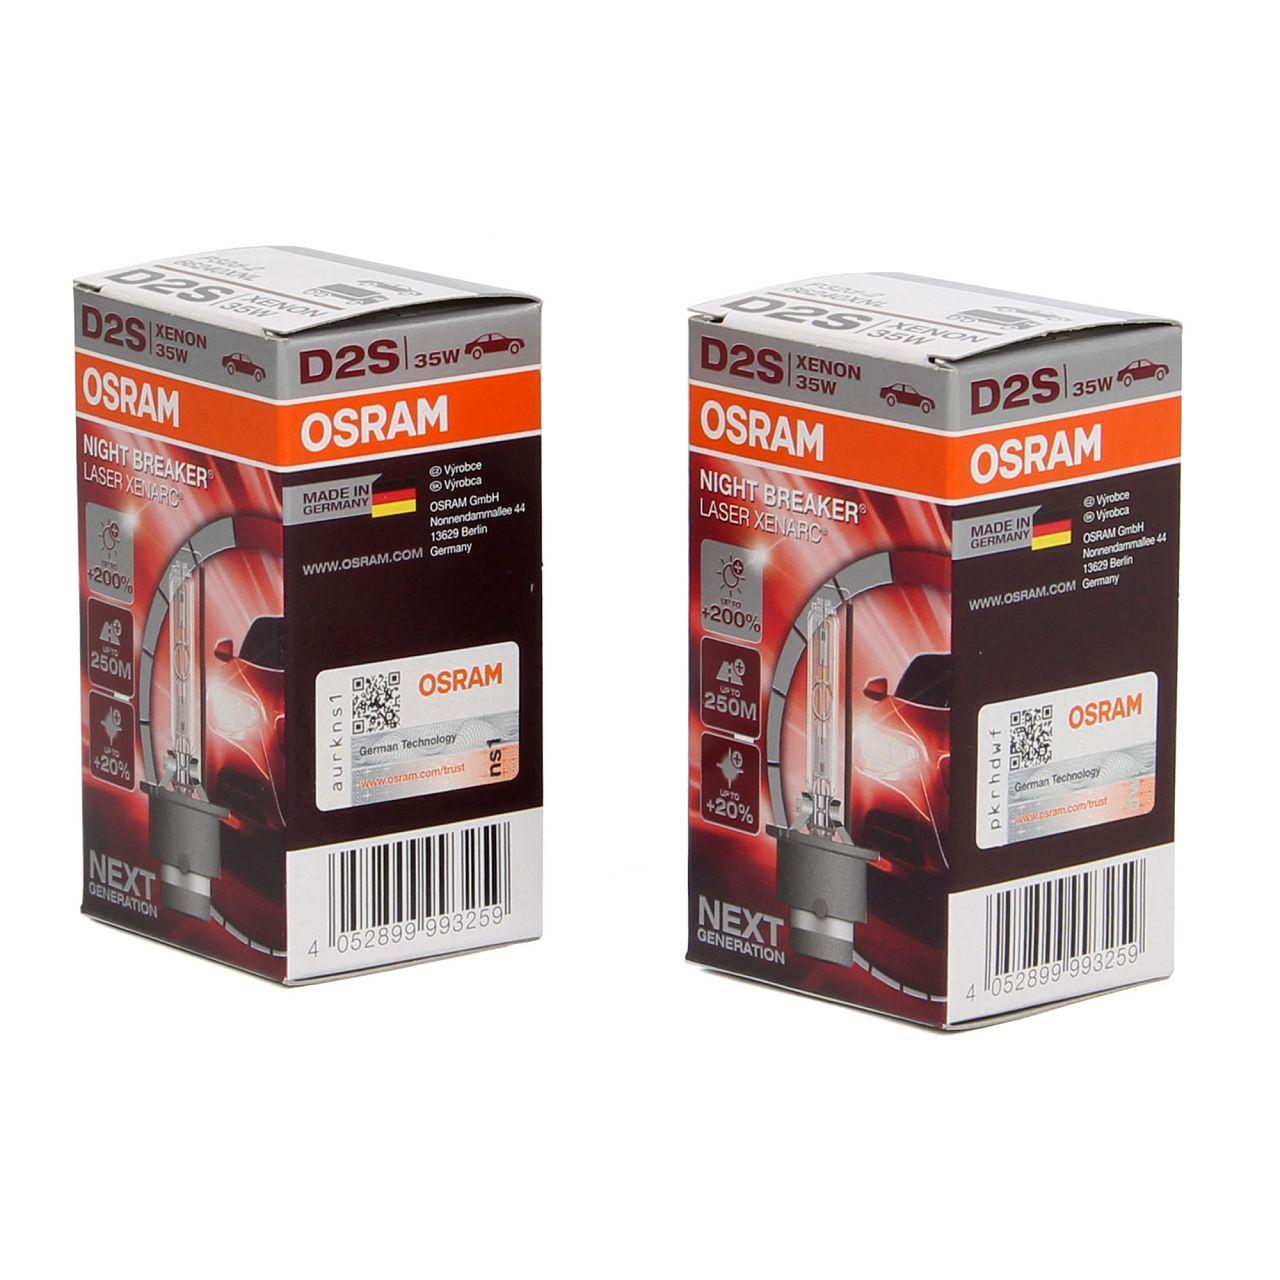 2x OSRAM Glühlampe D2S NIGHT BREAKER LASER 85V 35W P32d-2 next Generation +200%